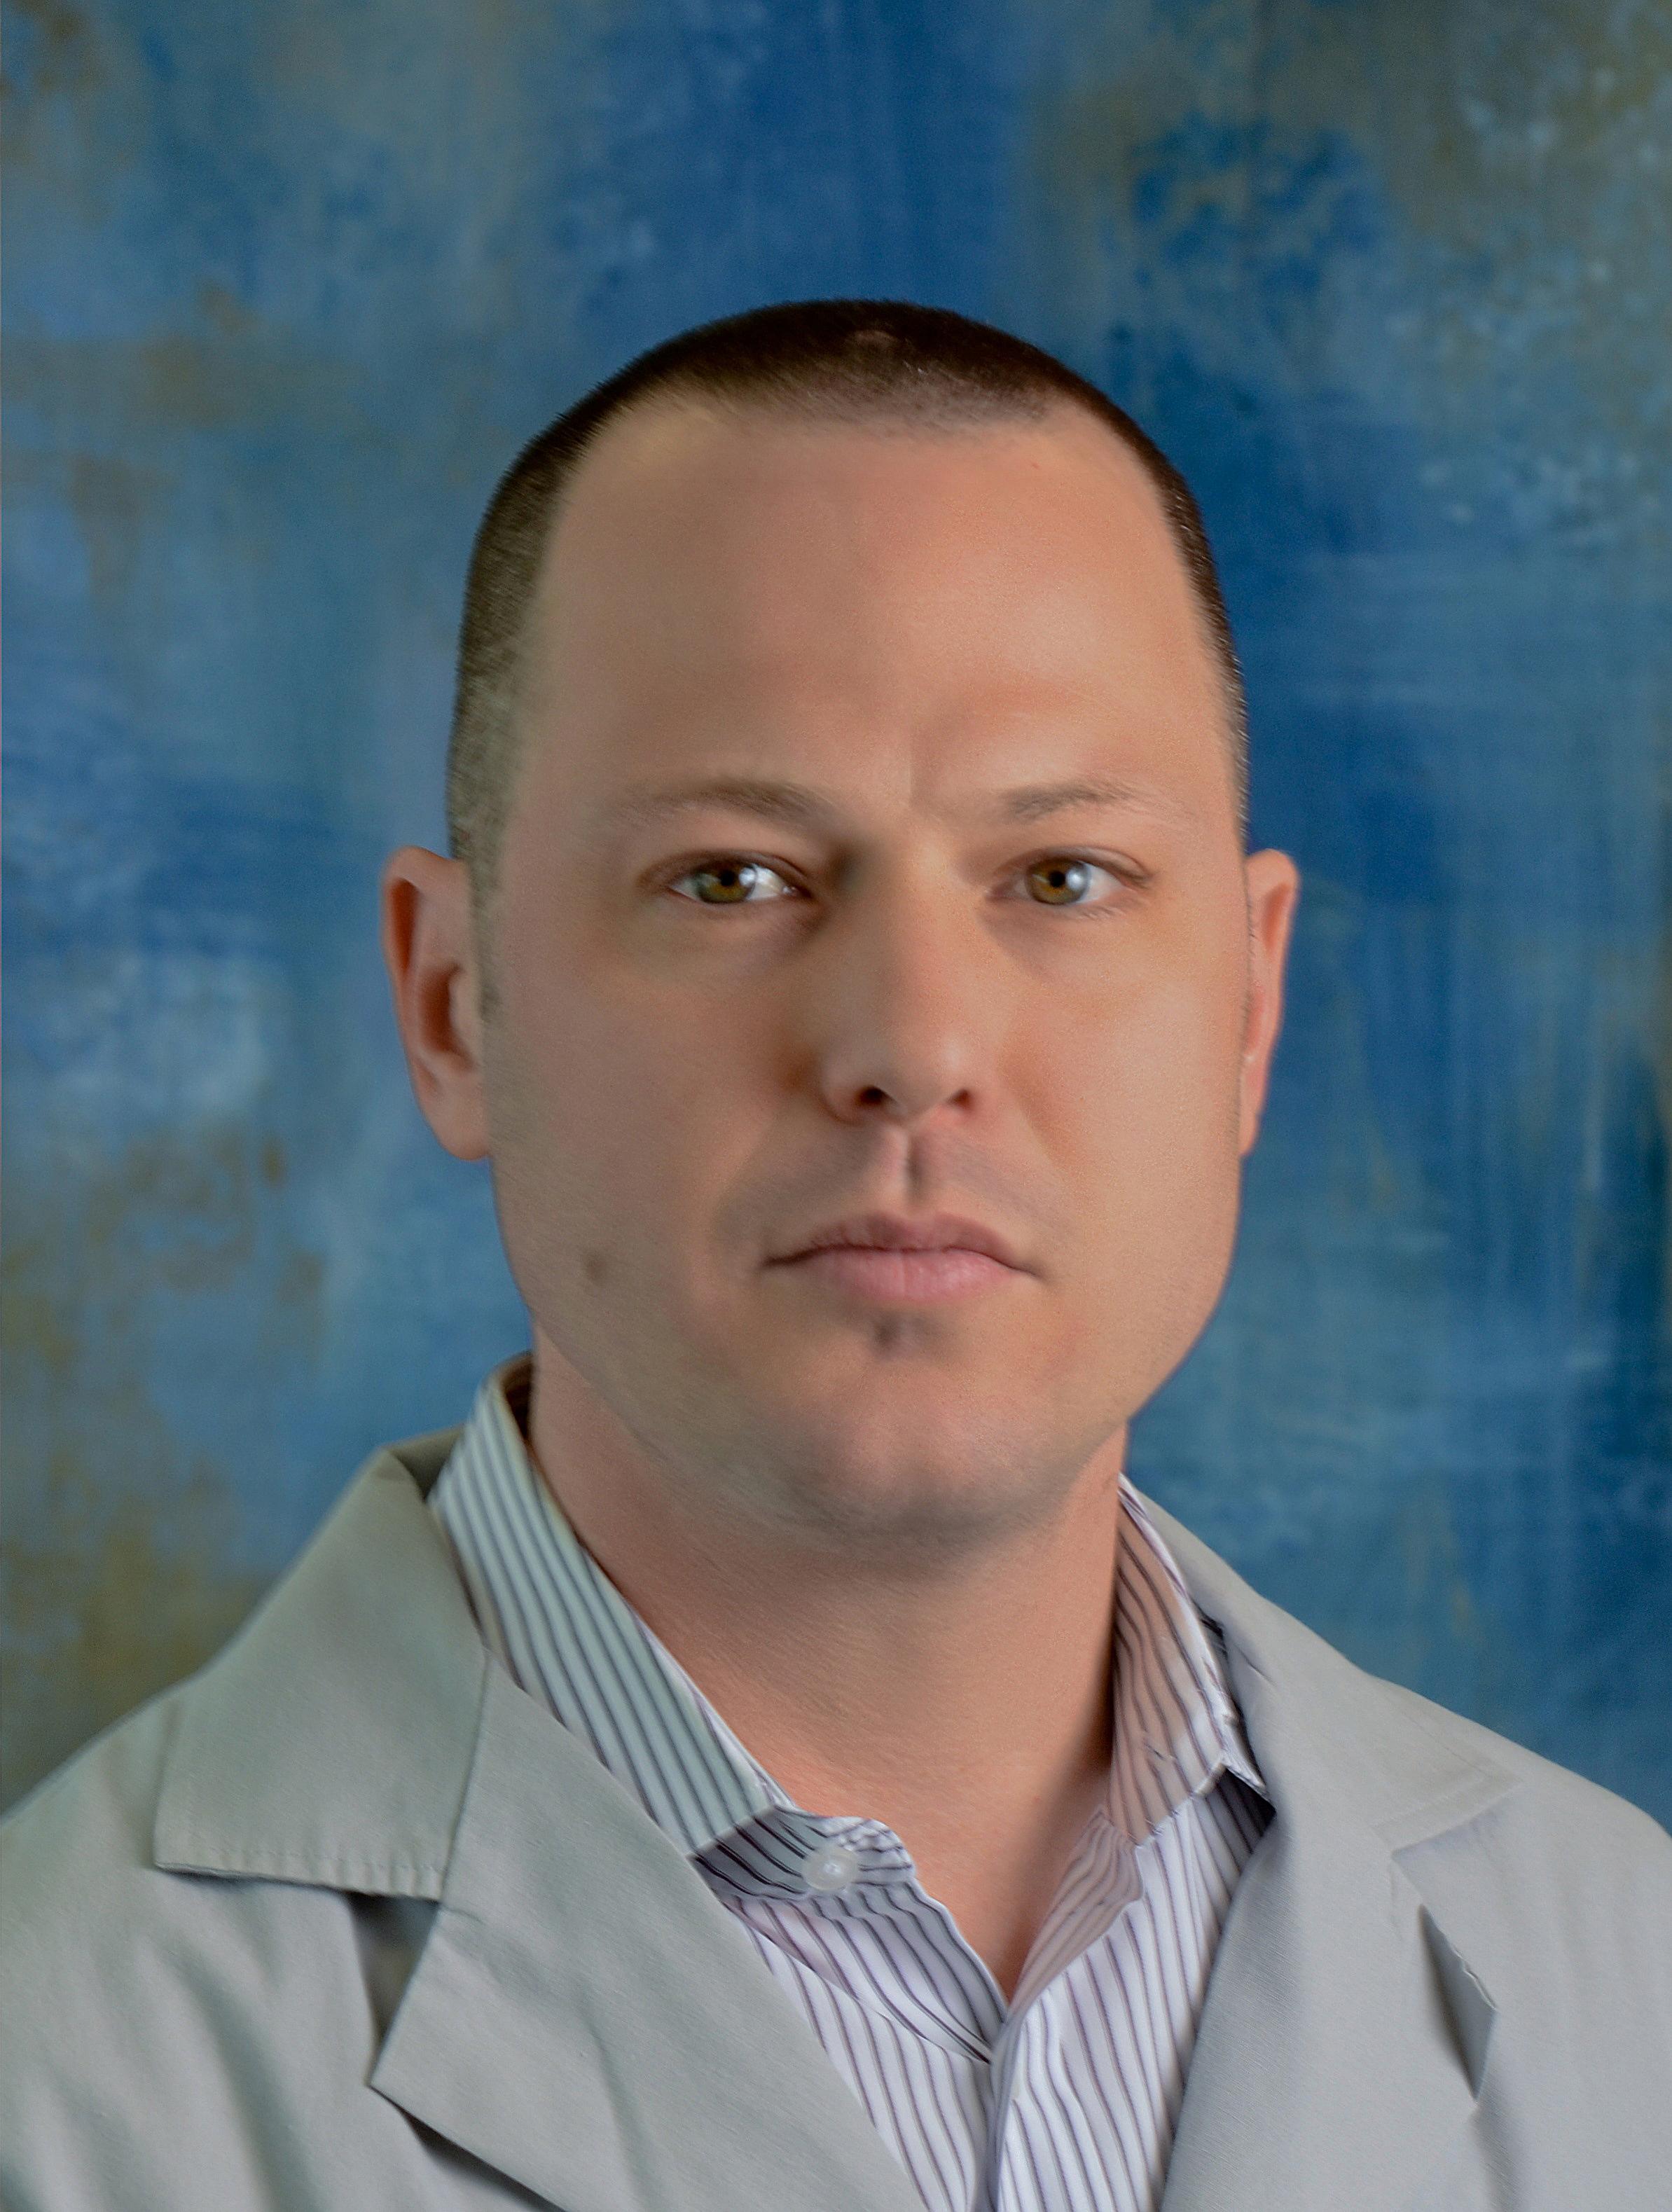 Michiel J. Bove, MD